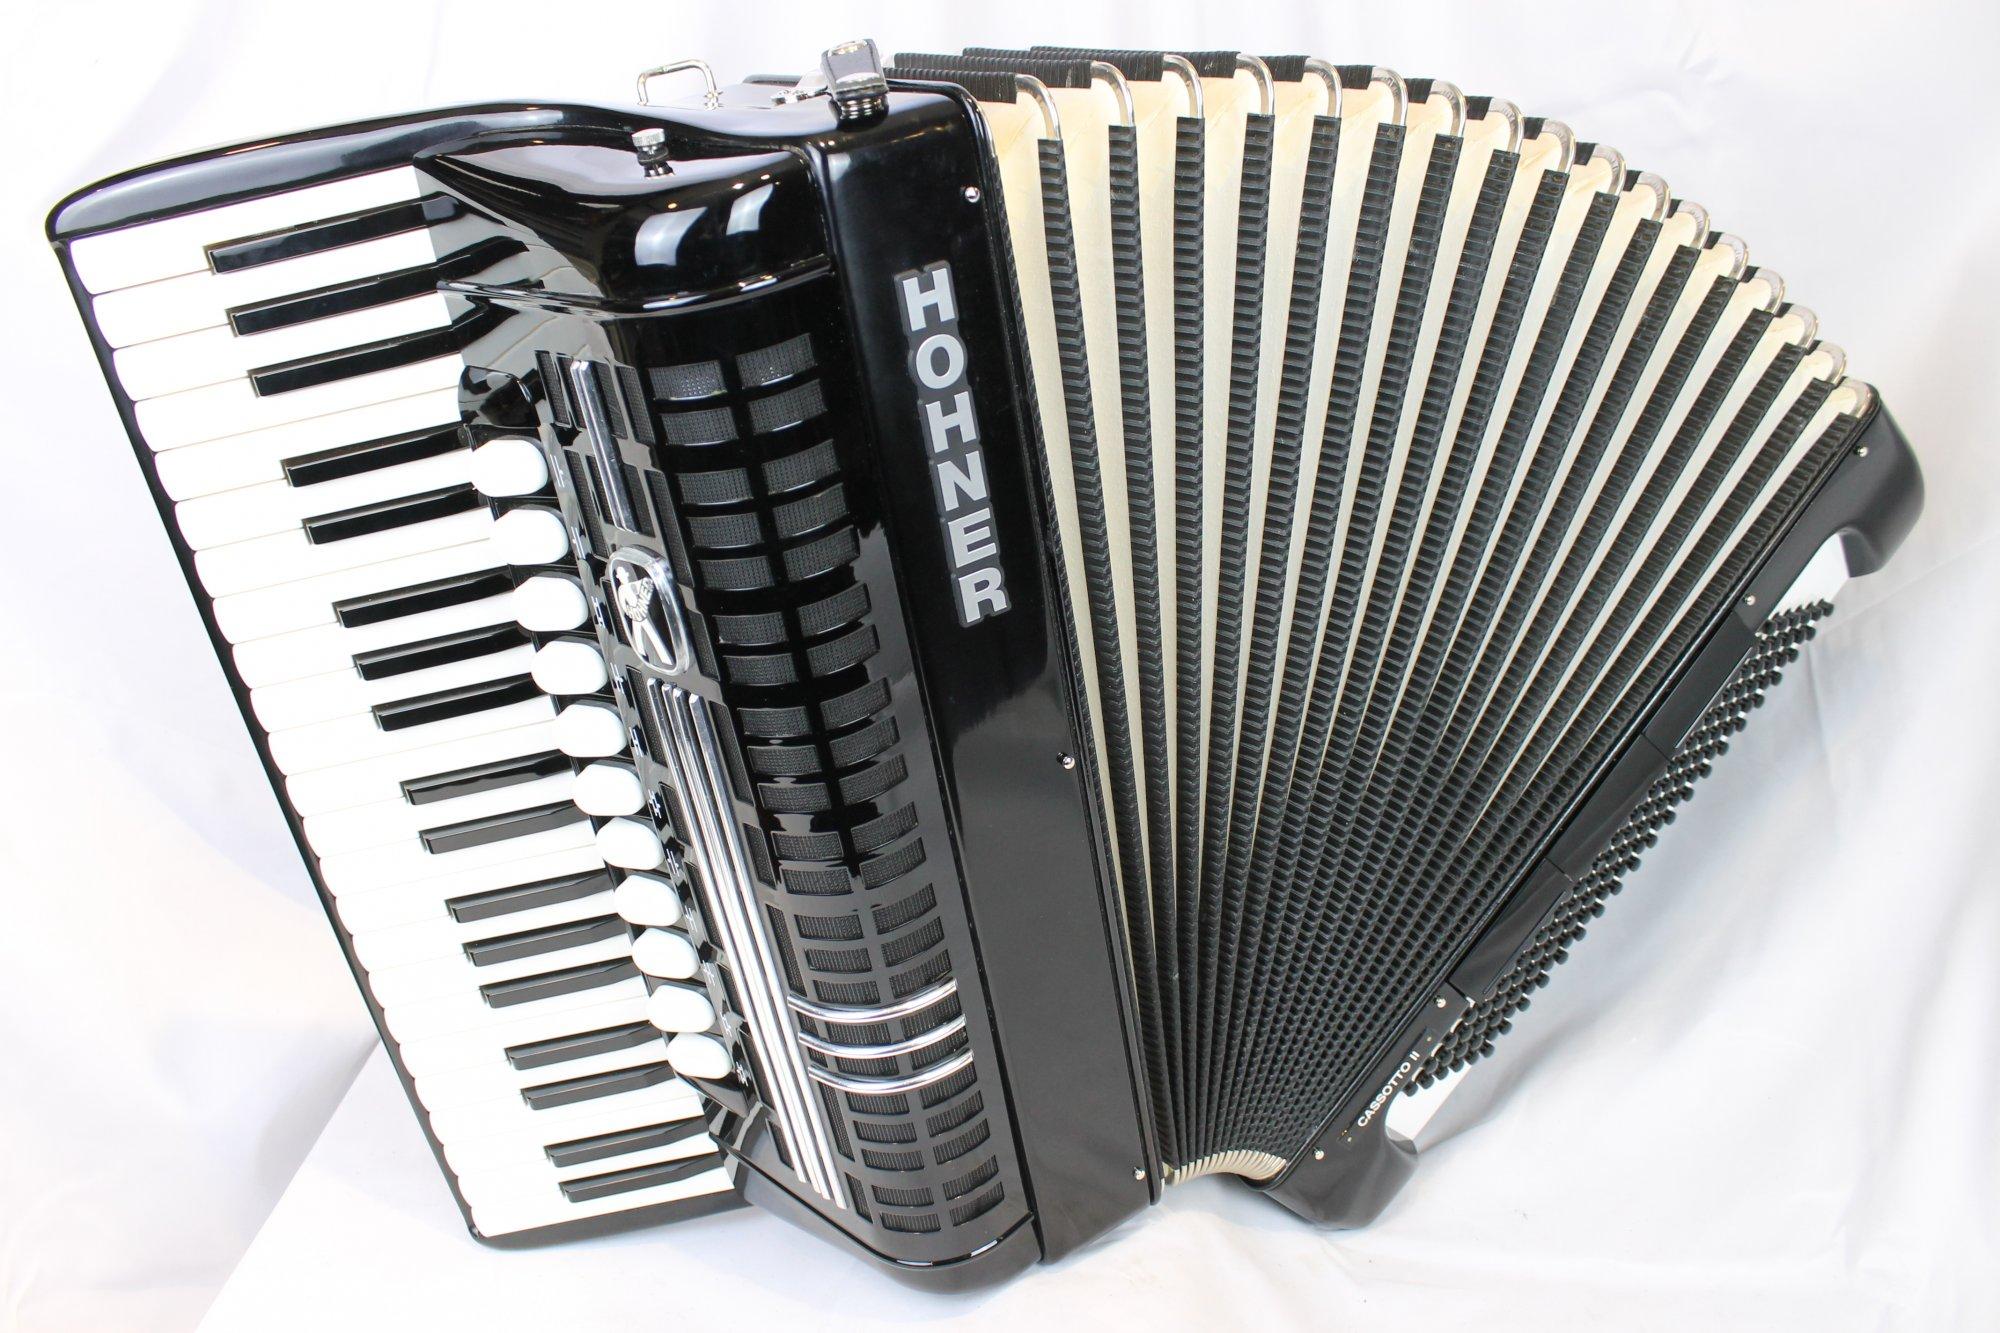 4079 - Black Hohner Cassotto II Piano Accordion LMMH 41 120